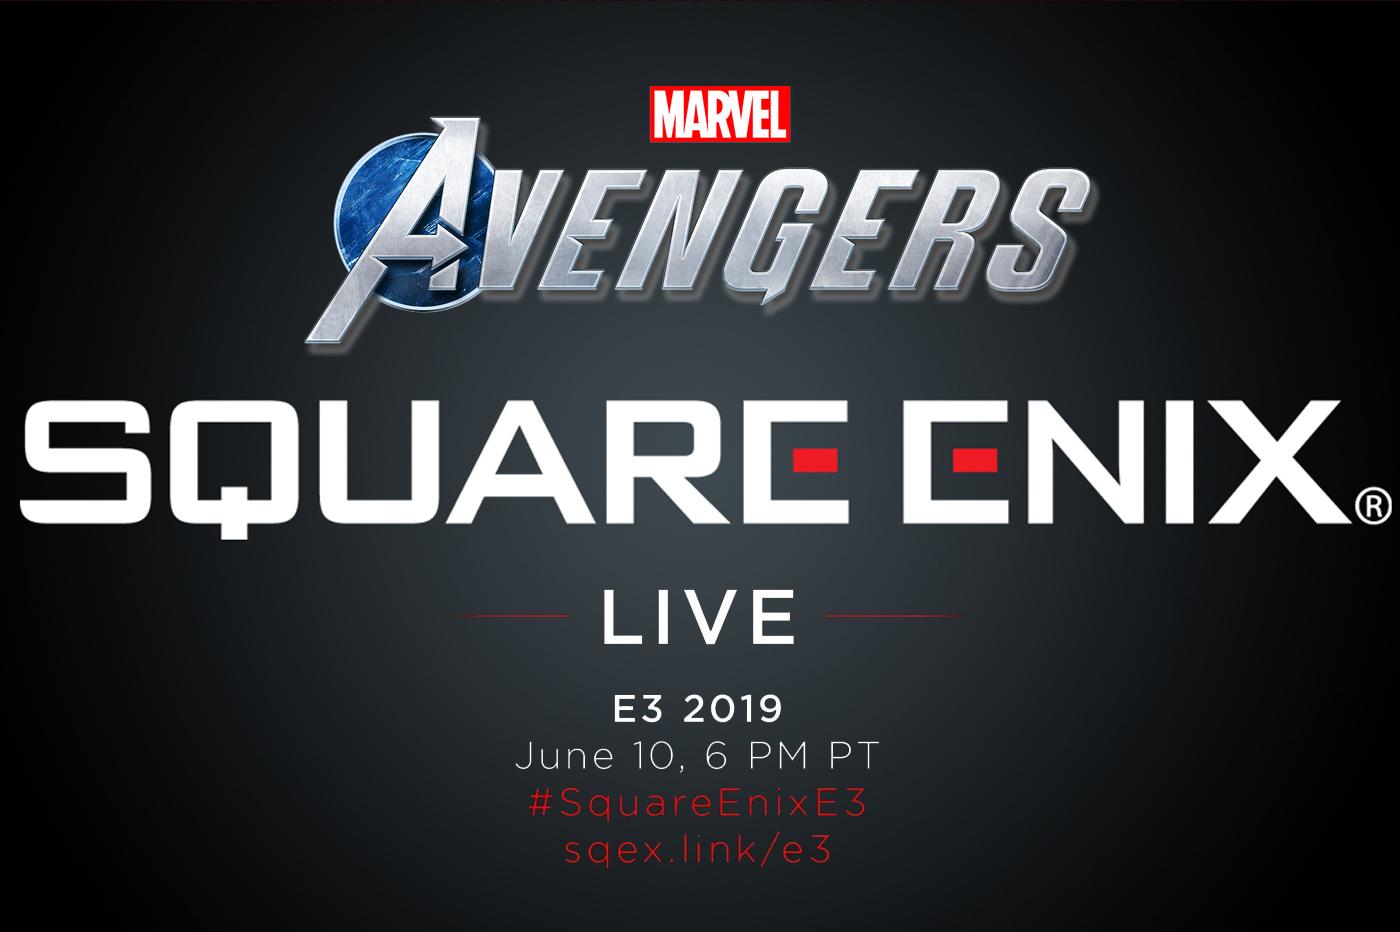 Square Enix Avengers E3 2019